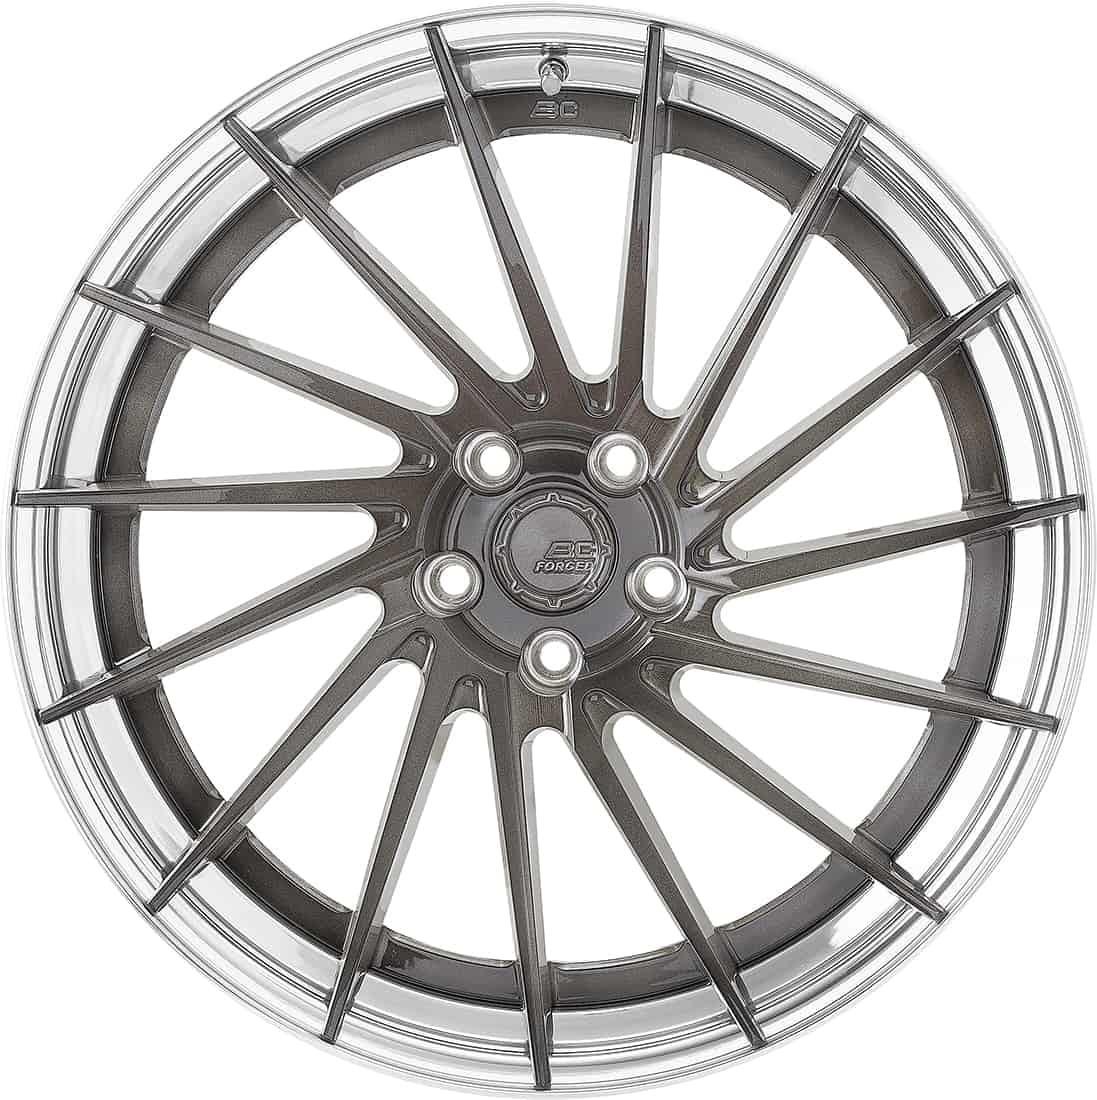 BC Forged wheels HCA215 (HCA Series)